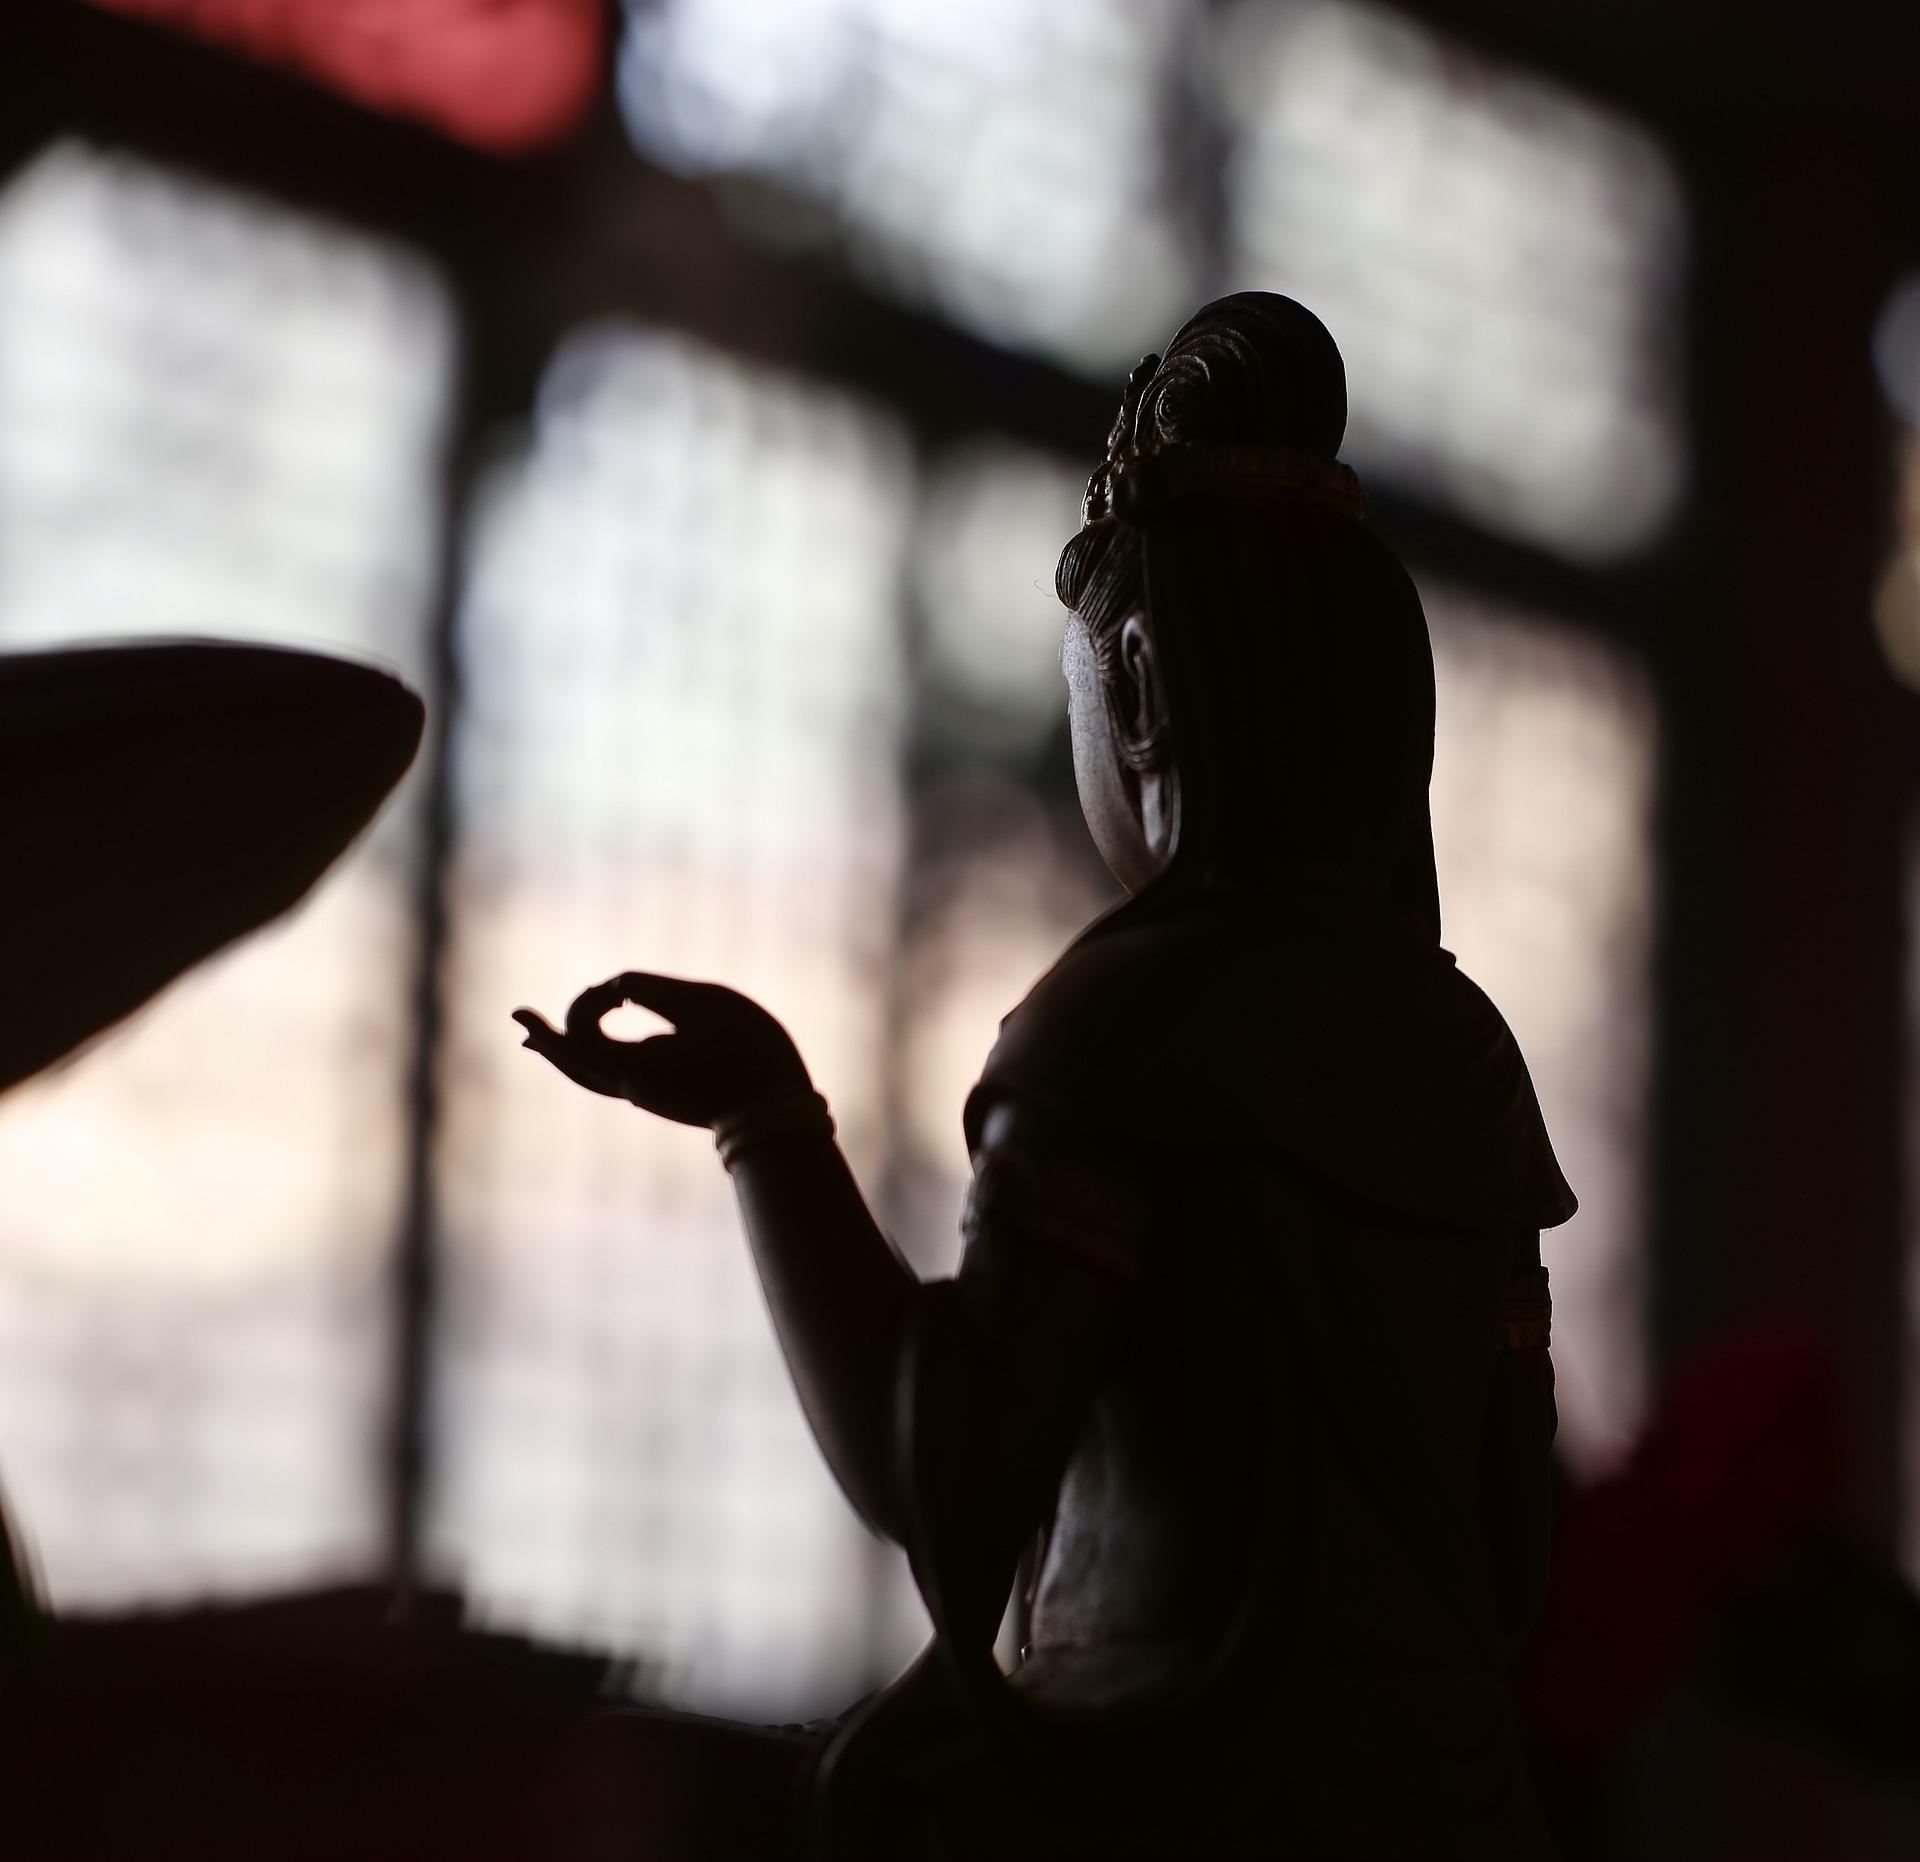 Prayer to Mañjuśrī    A beautiful short prayer to the Bodhisattva of Wisdom, translated from Tibetan.